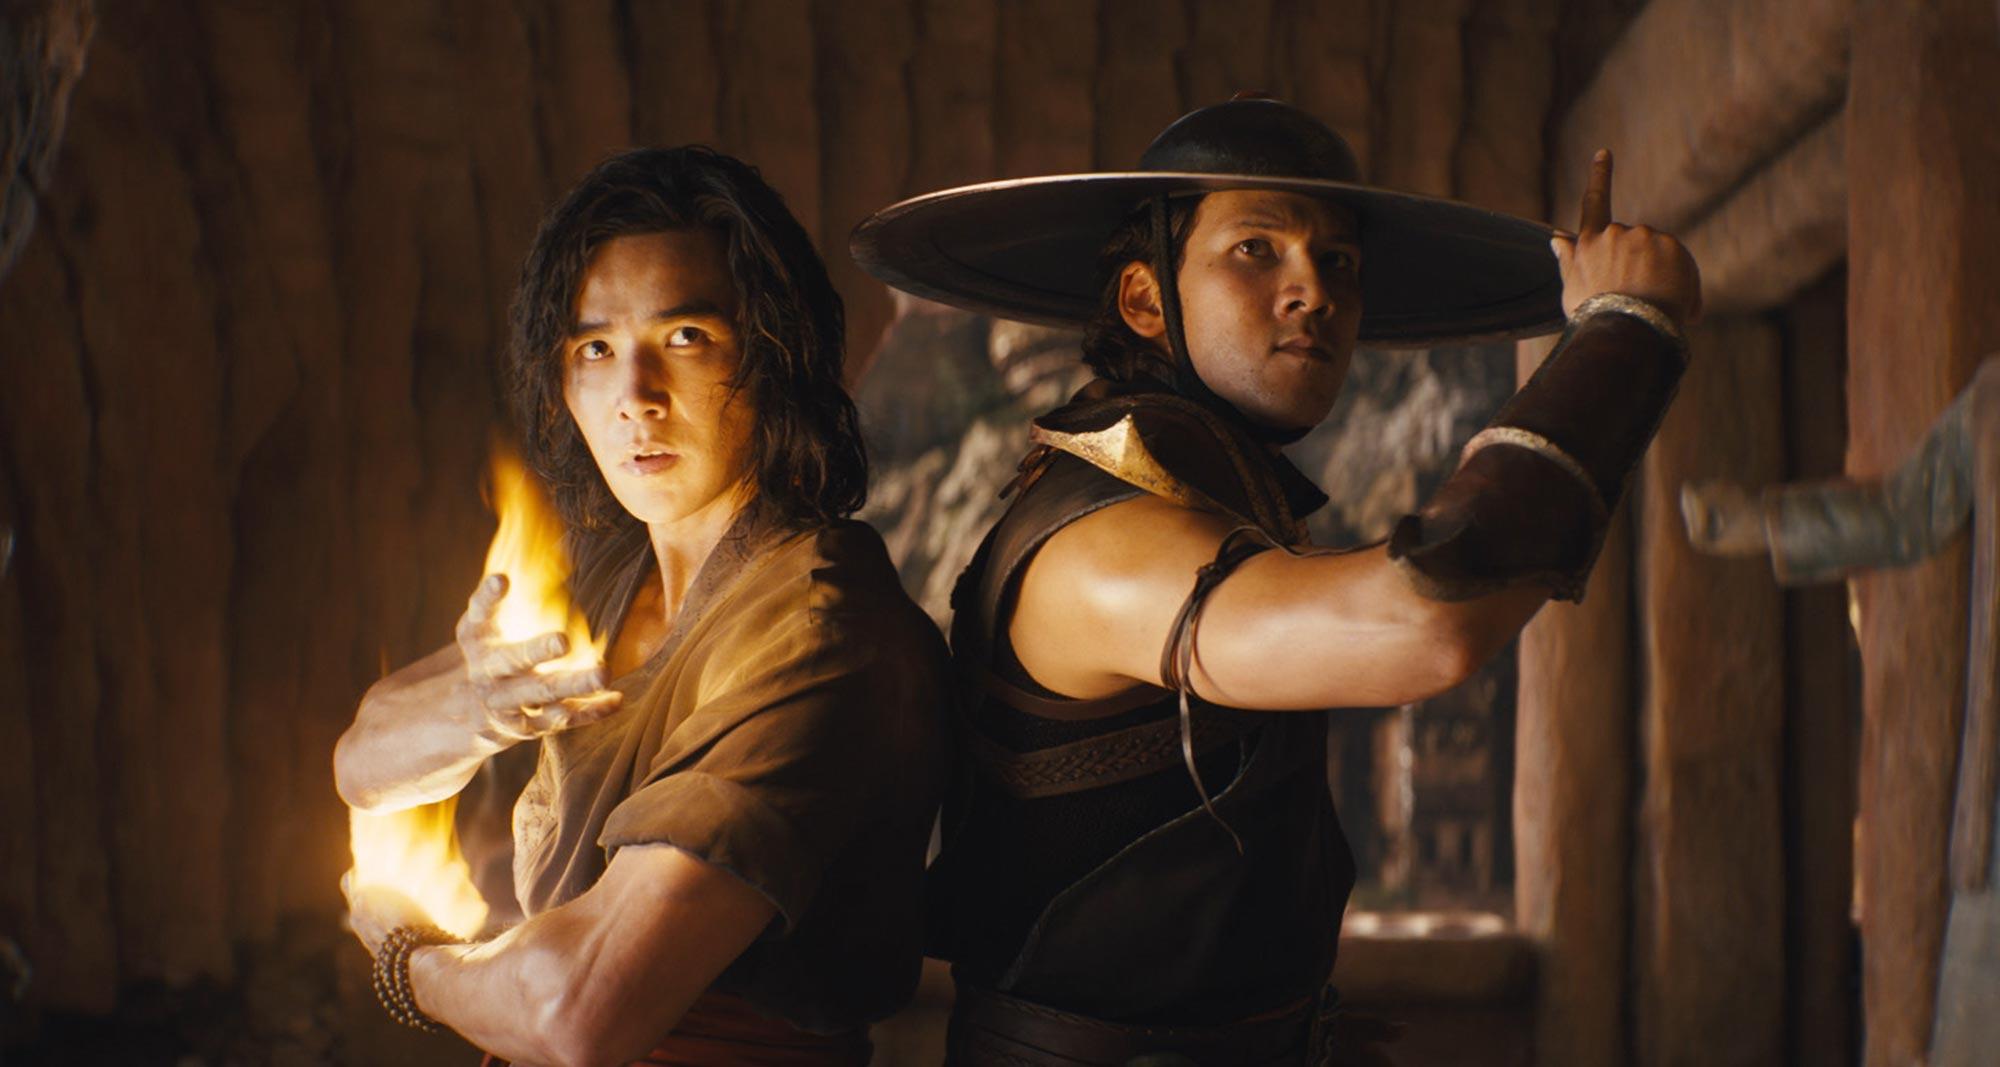 Ludi Lin as Liu Kang and Max Huang as Kung Lao in film Mortal Kombat